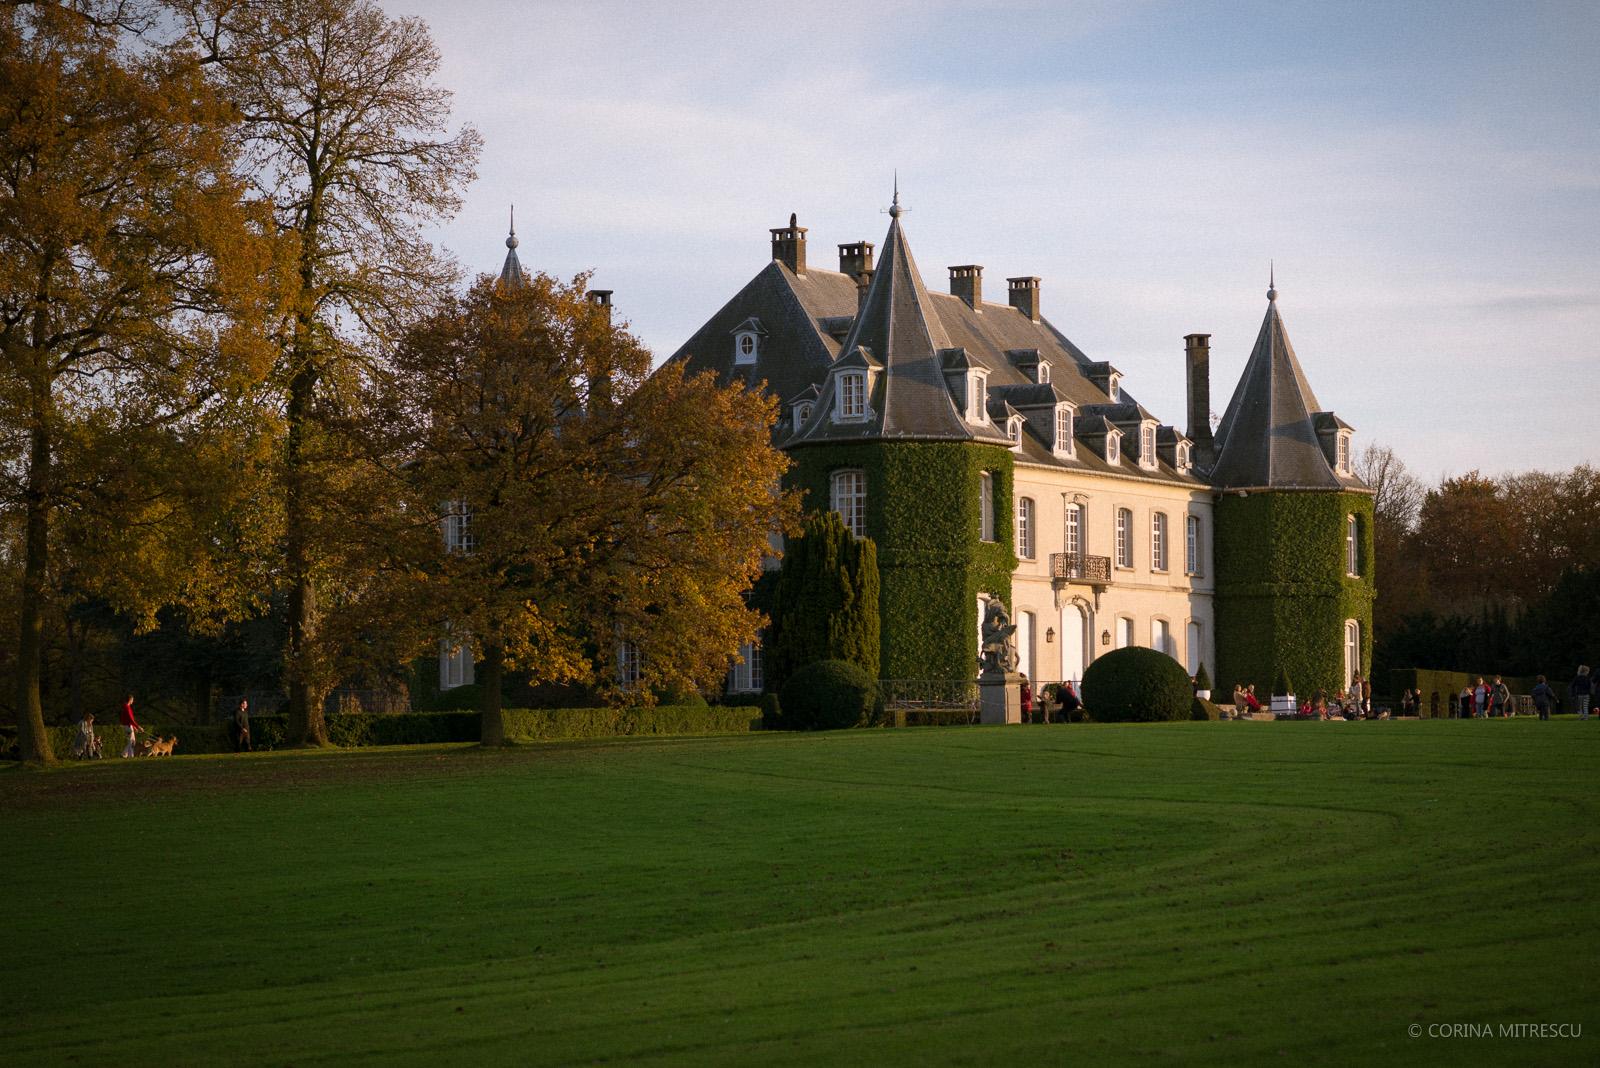 La Hulpe Belgium  City new picture : ... La Hulpe Castle in Belgium . http://photocory.com/la hulpe castle